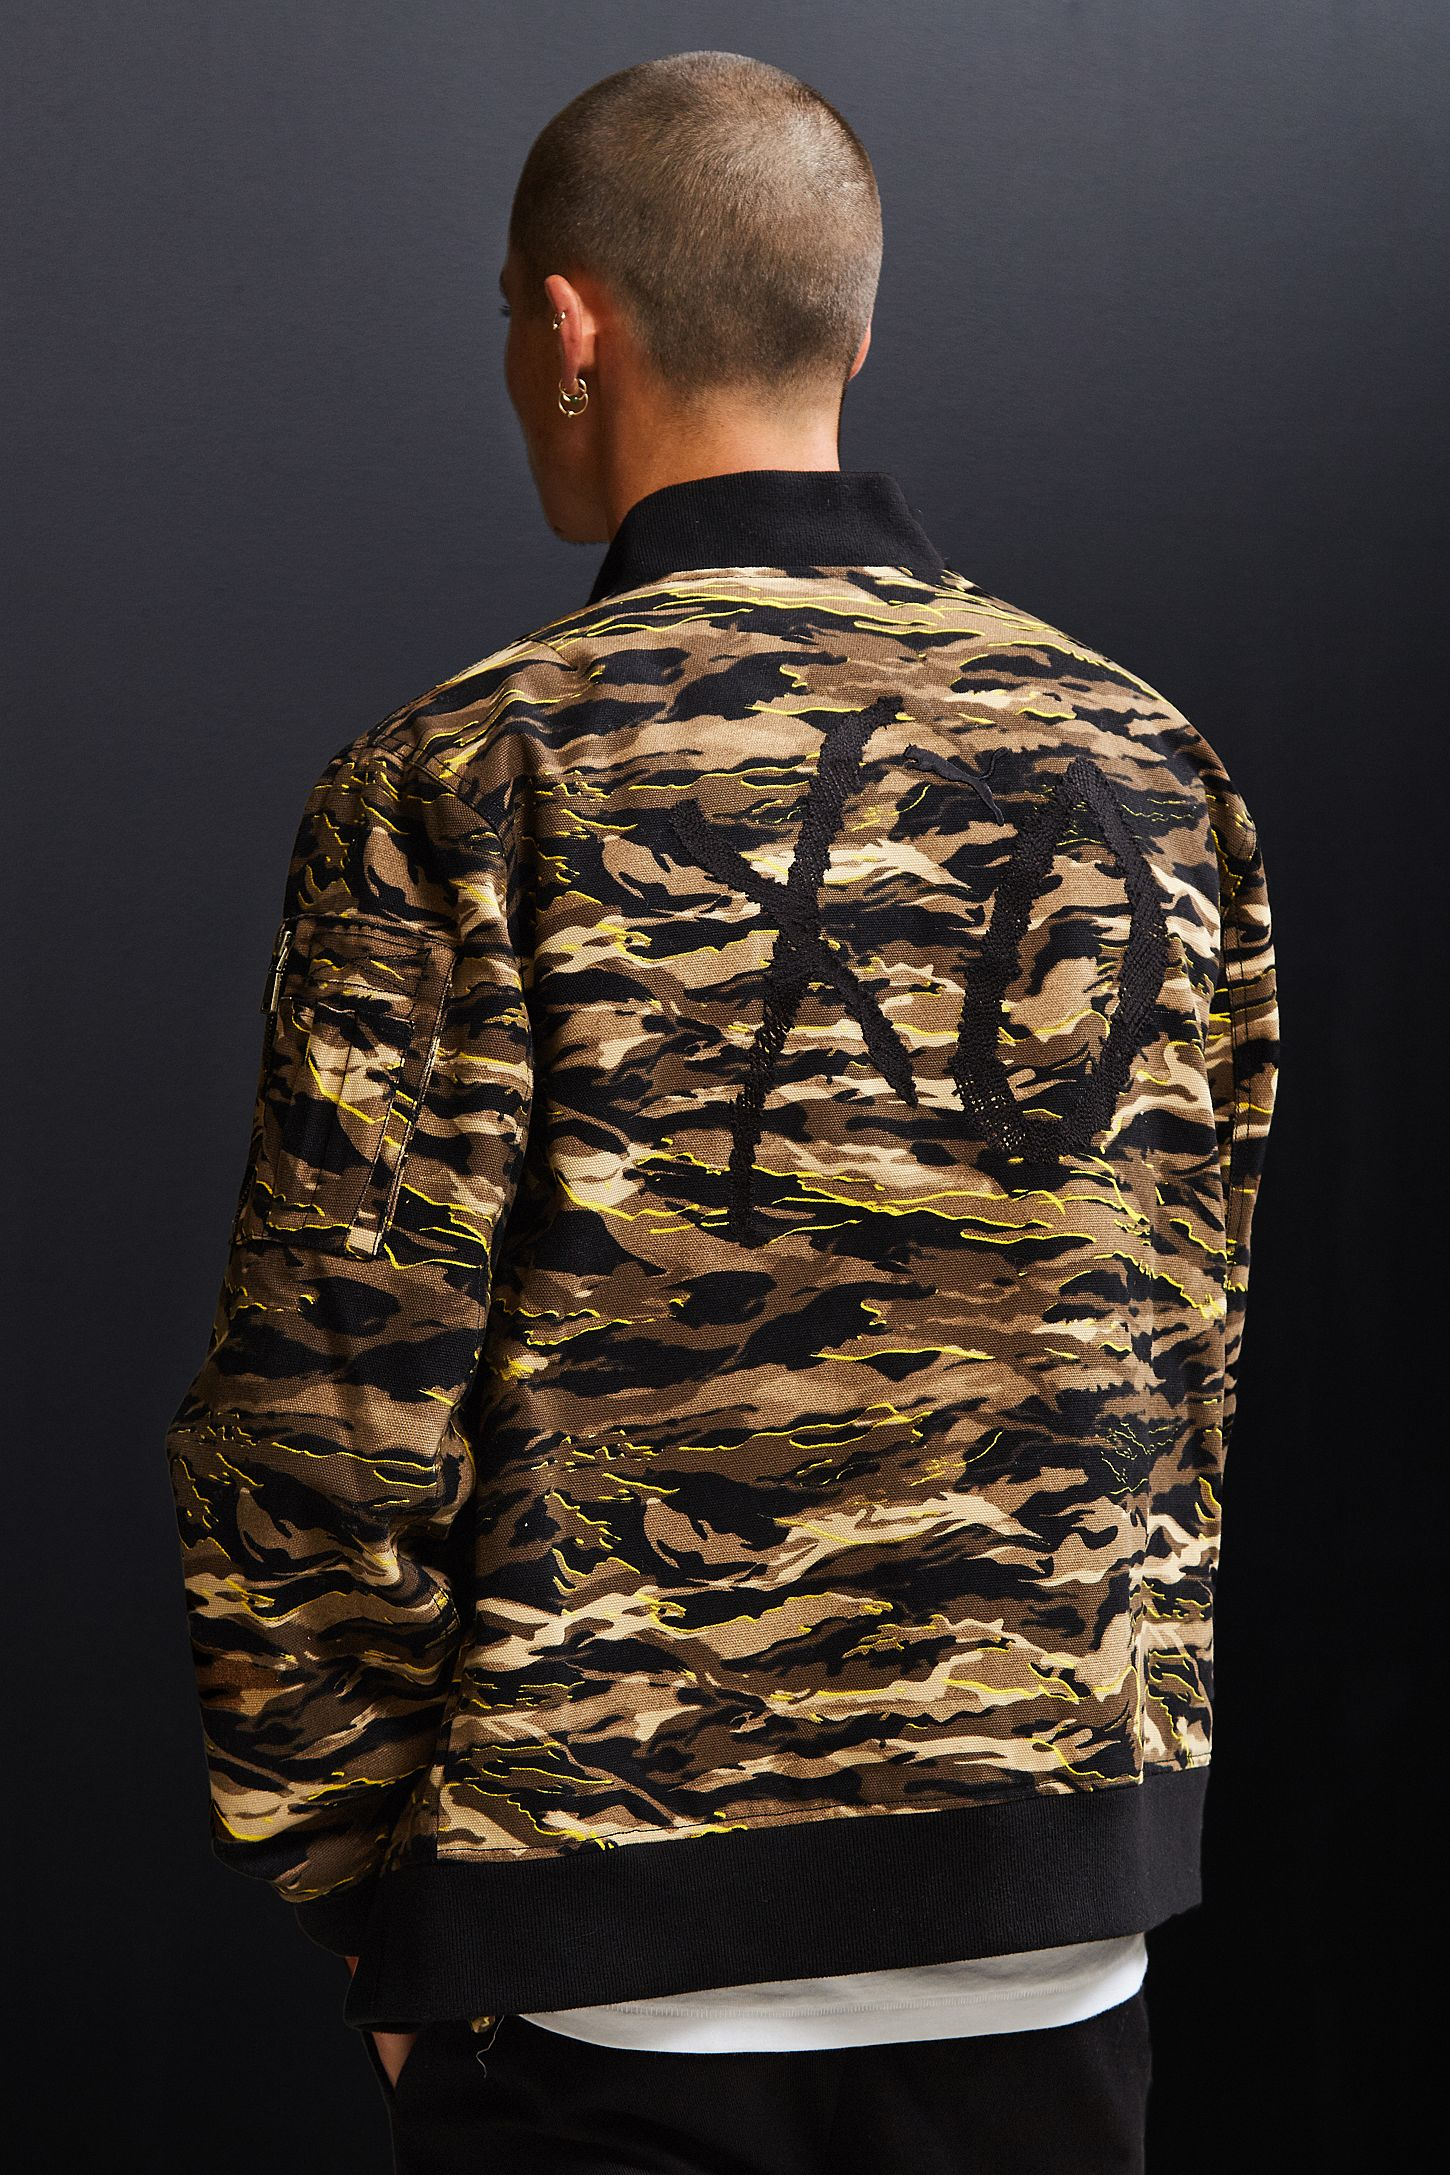 bd3b84475bcf Puma XO The Weeknd Camo Bomber Jacket